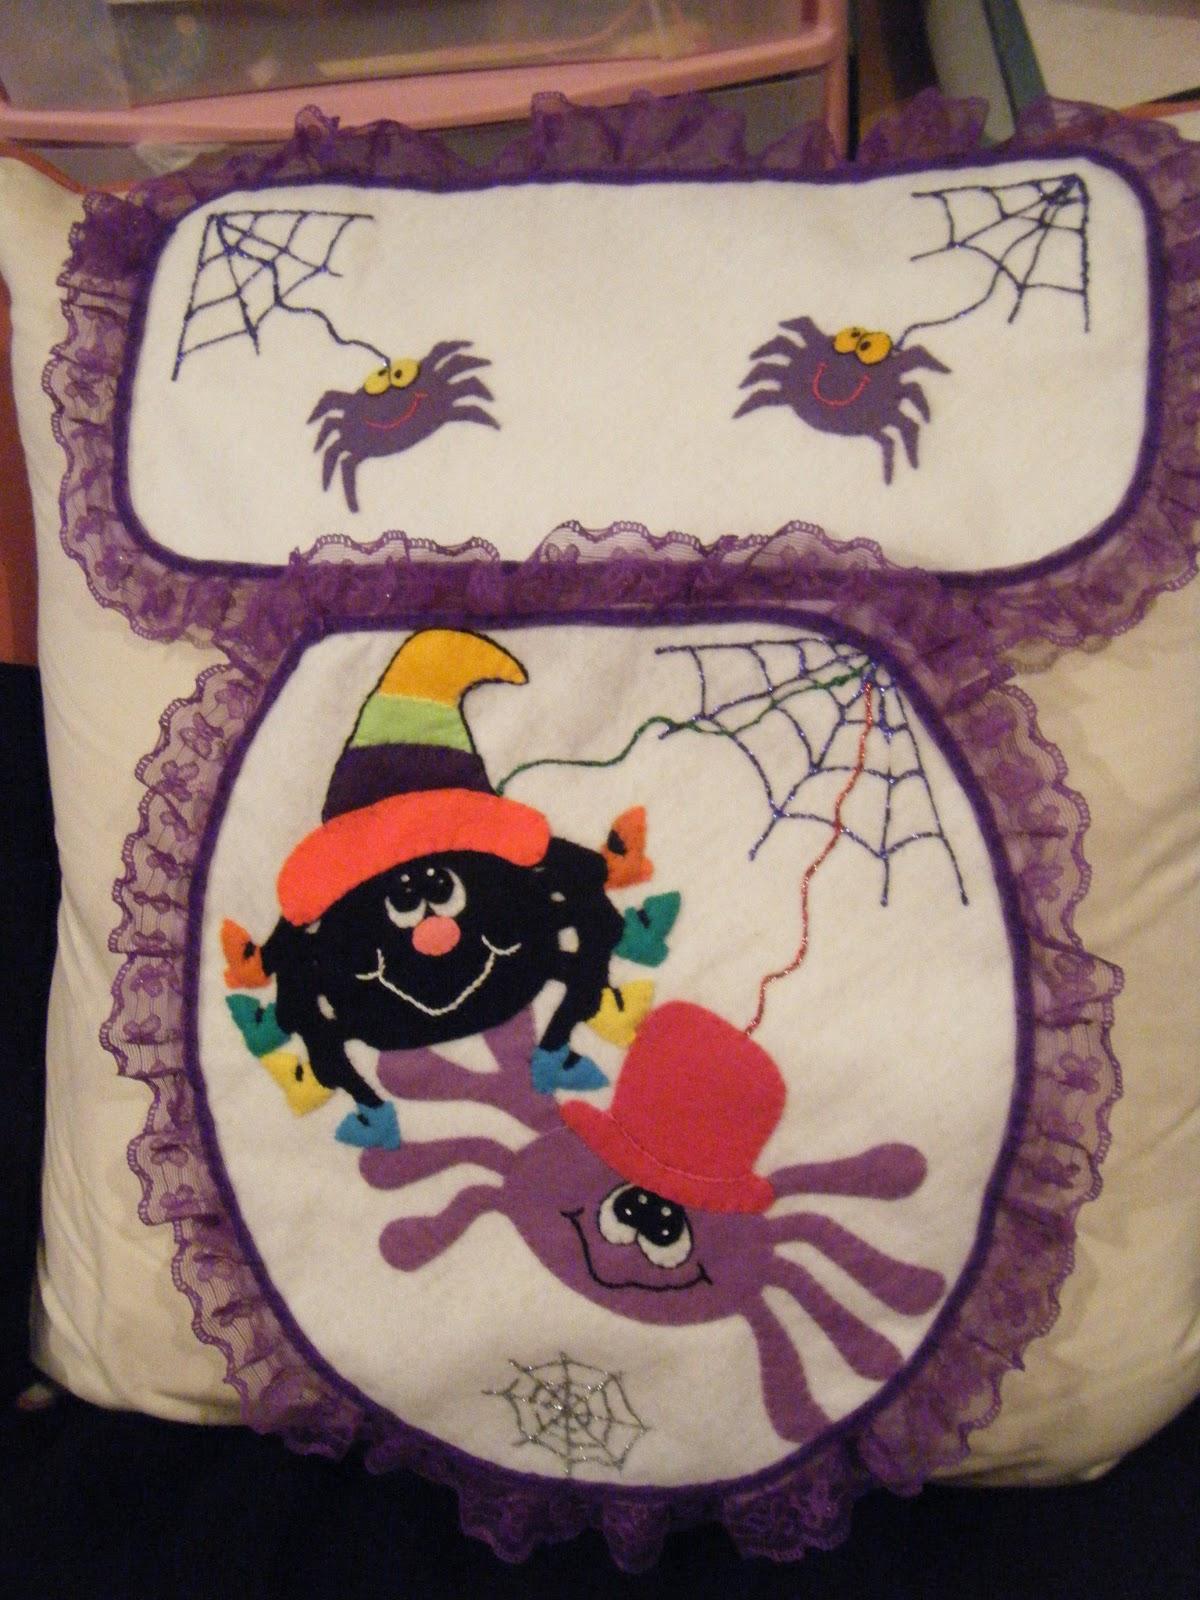 Juegos De Baño Halloween:UN GATO DE TRAPO: ♥ JUEGO DE BAÑO ARAÑITAS ♥